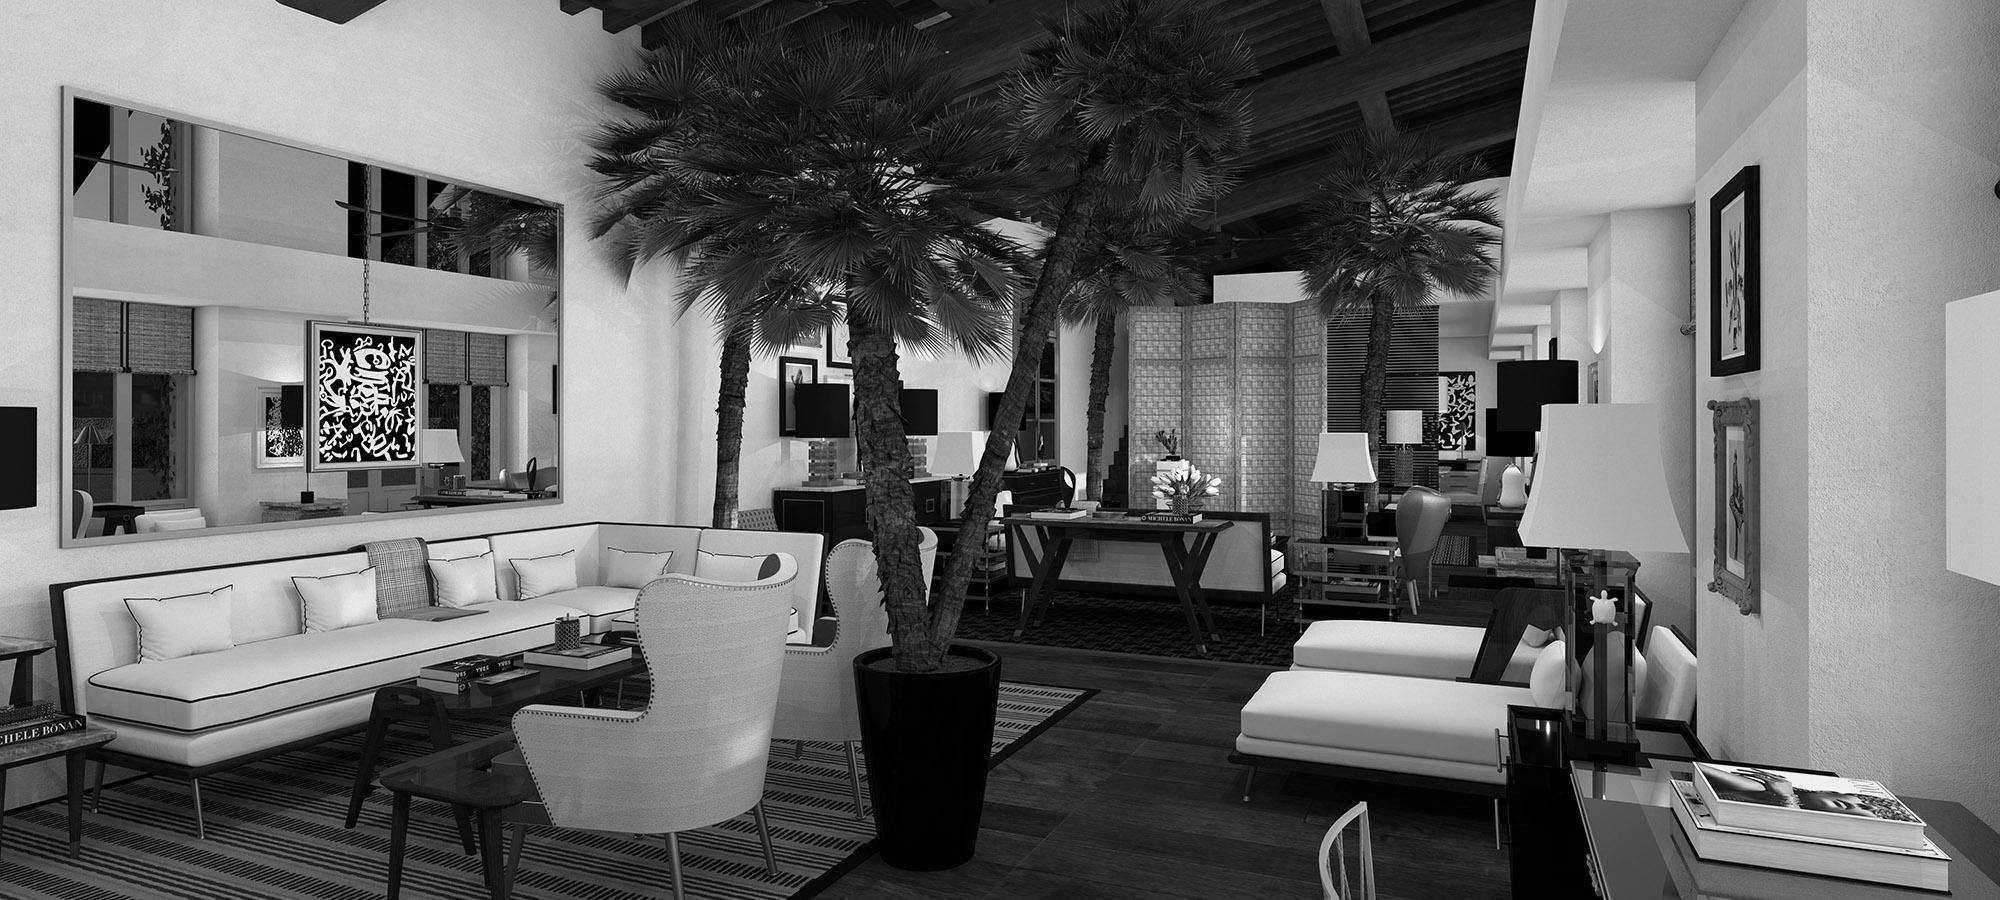 michele-bonan-interiors-showroom-1-bw-1